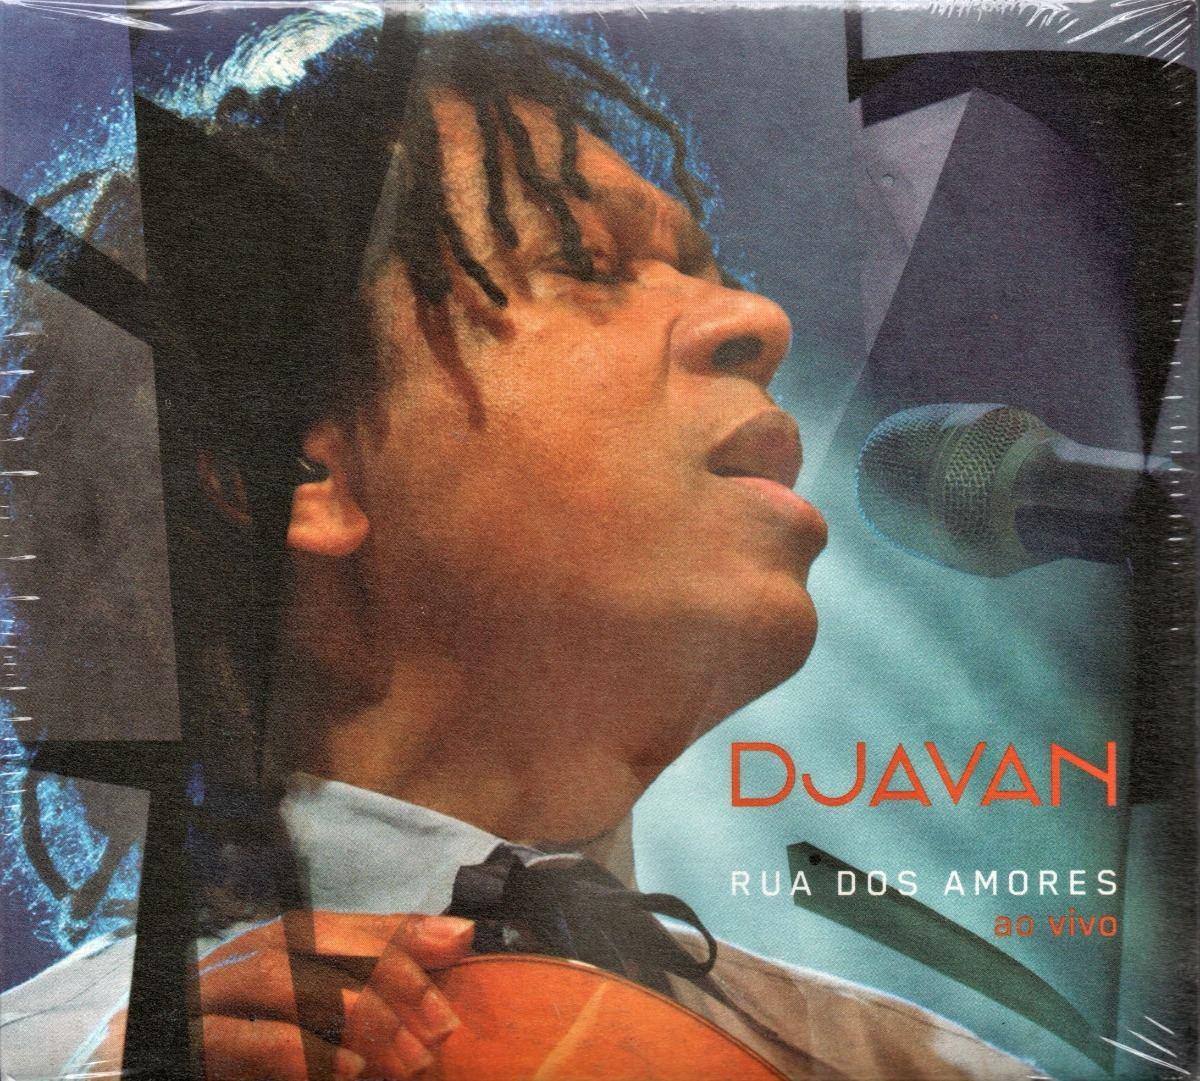 gratis cd djavan rua dos amores